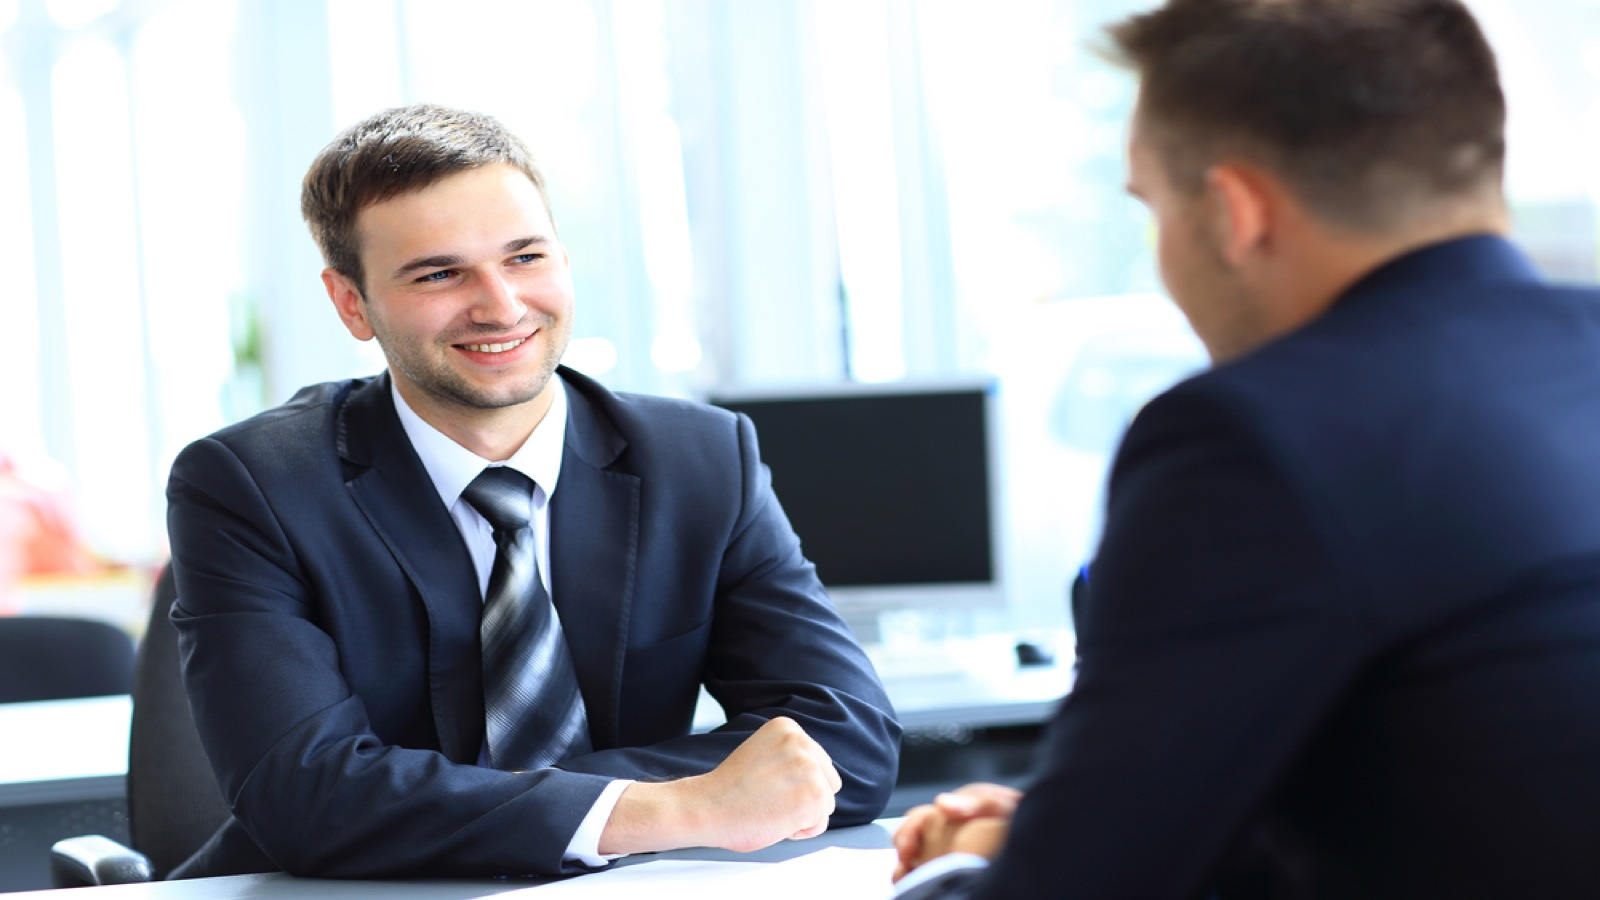 7 Ways to Nail a Part-Time Job